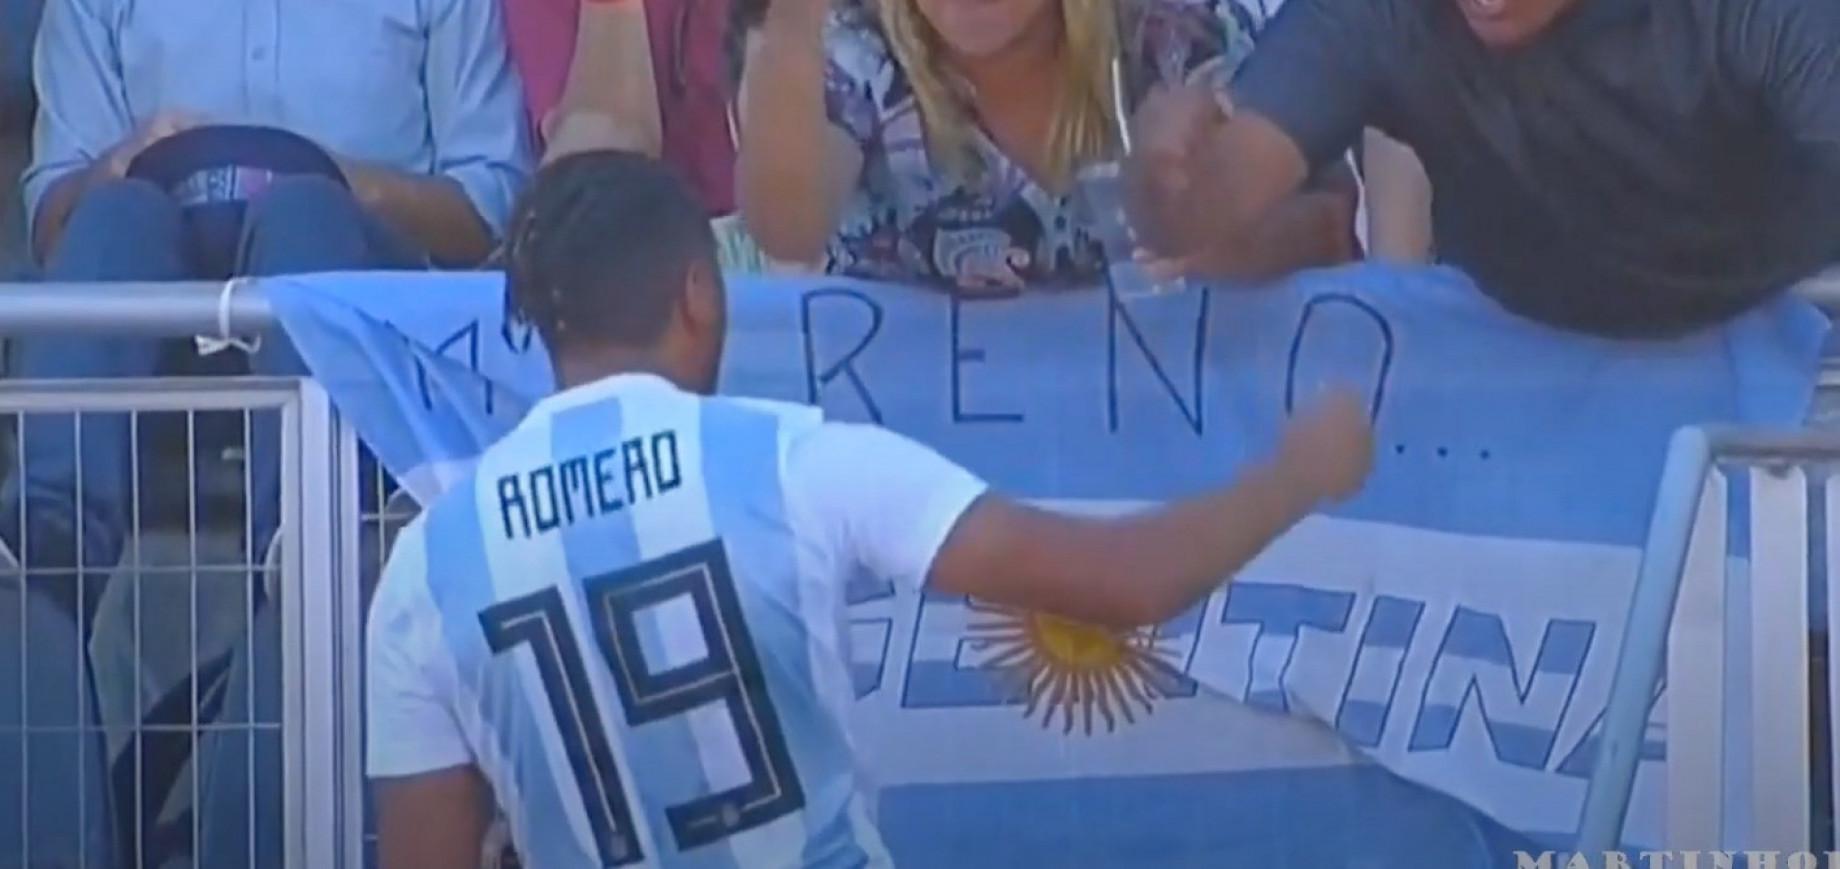 maxi-romero-argentina-psv-screen.jpeg